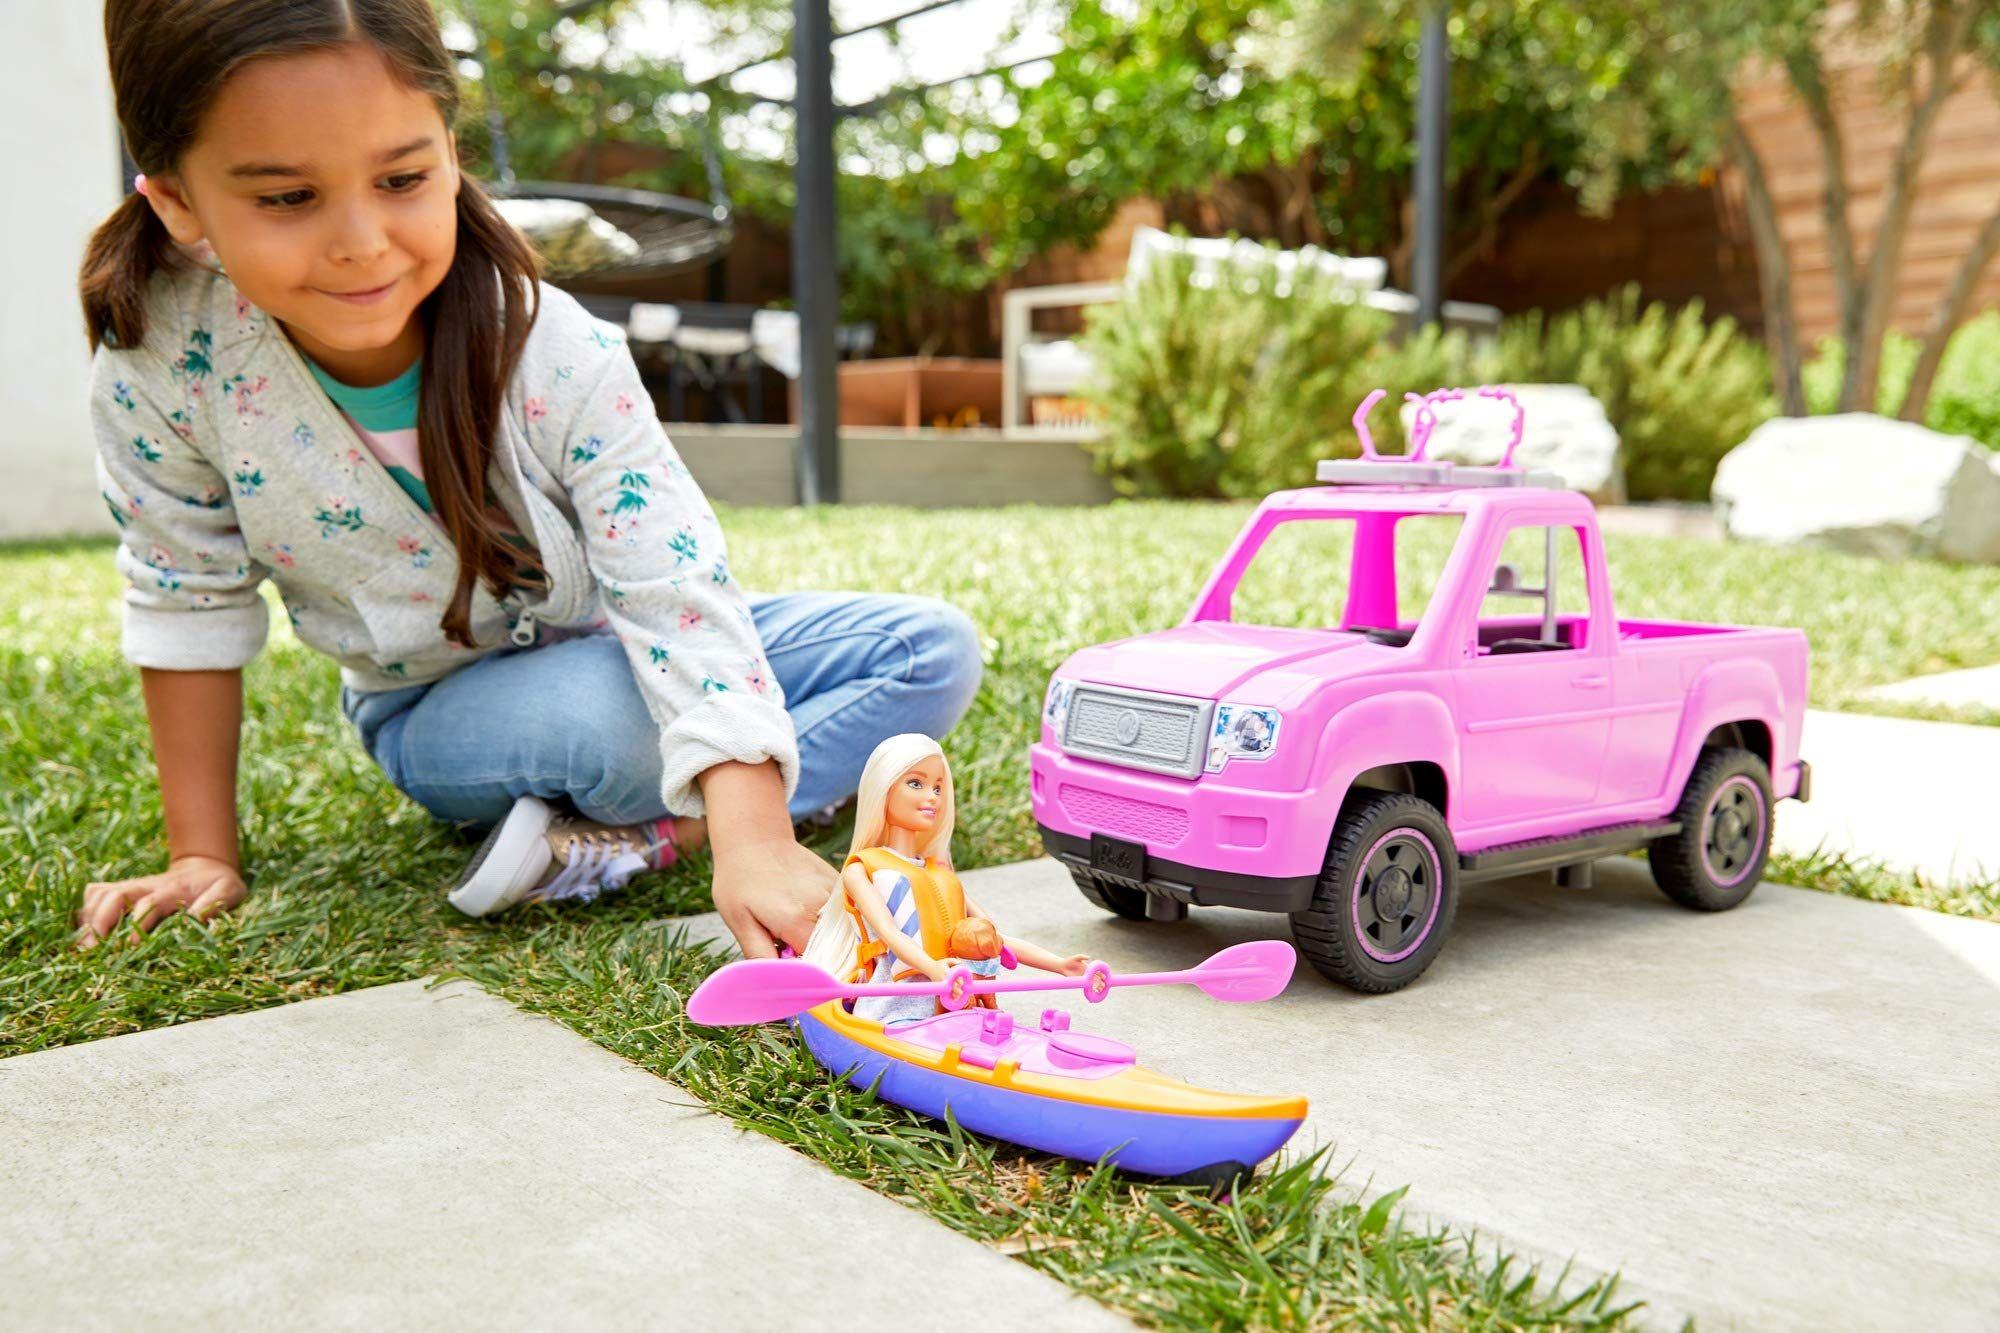 Pink Truck And Sea Kayak Adventure Playset Barbie Camping Fun Doll